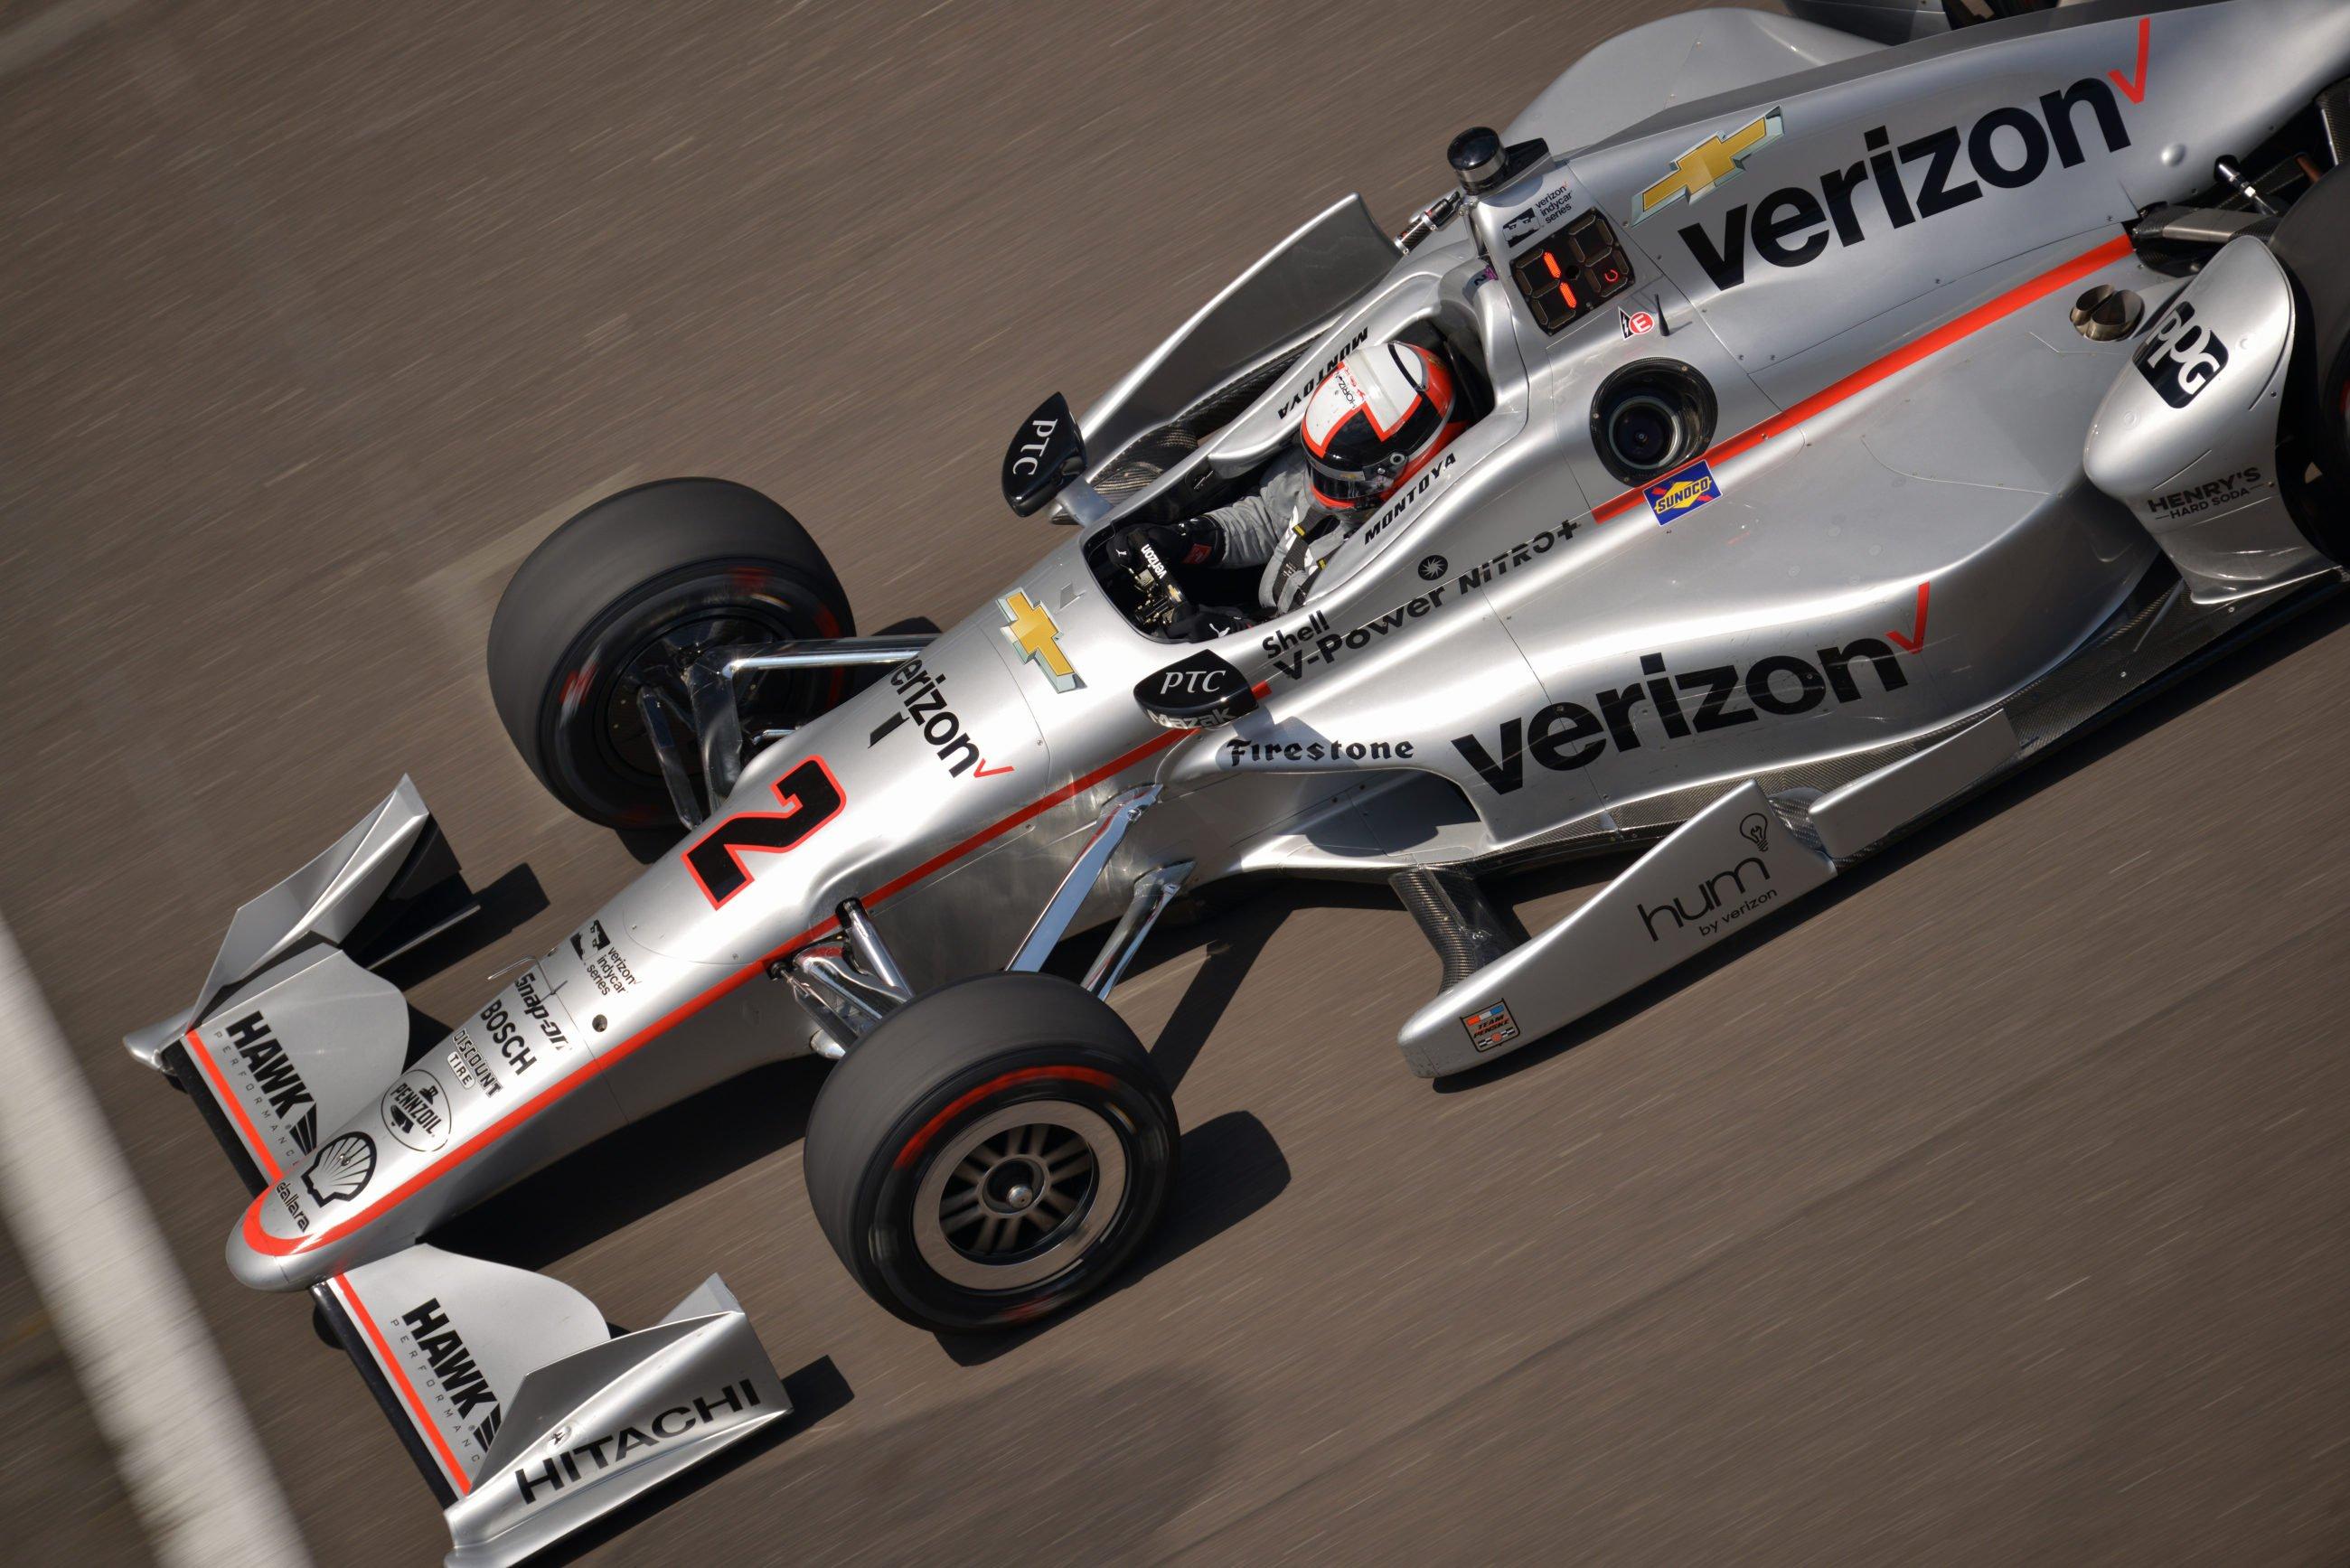 Juan Pablo Montoya Returns to Team Penske for 2017 Indianapolis 500